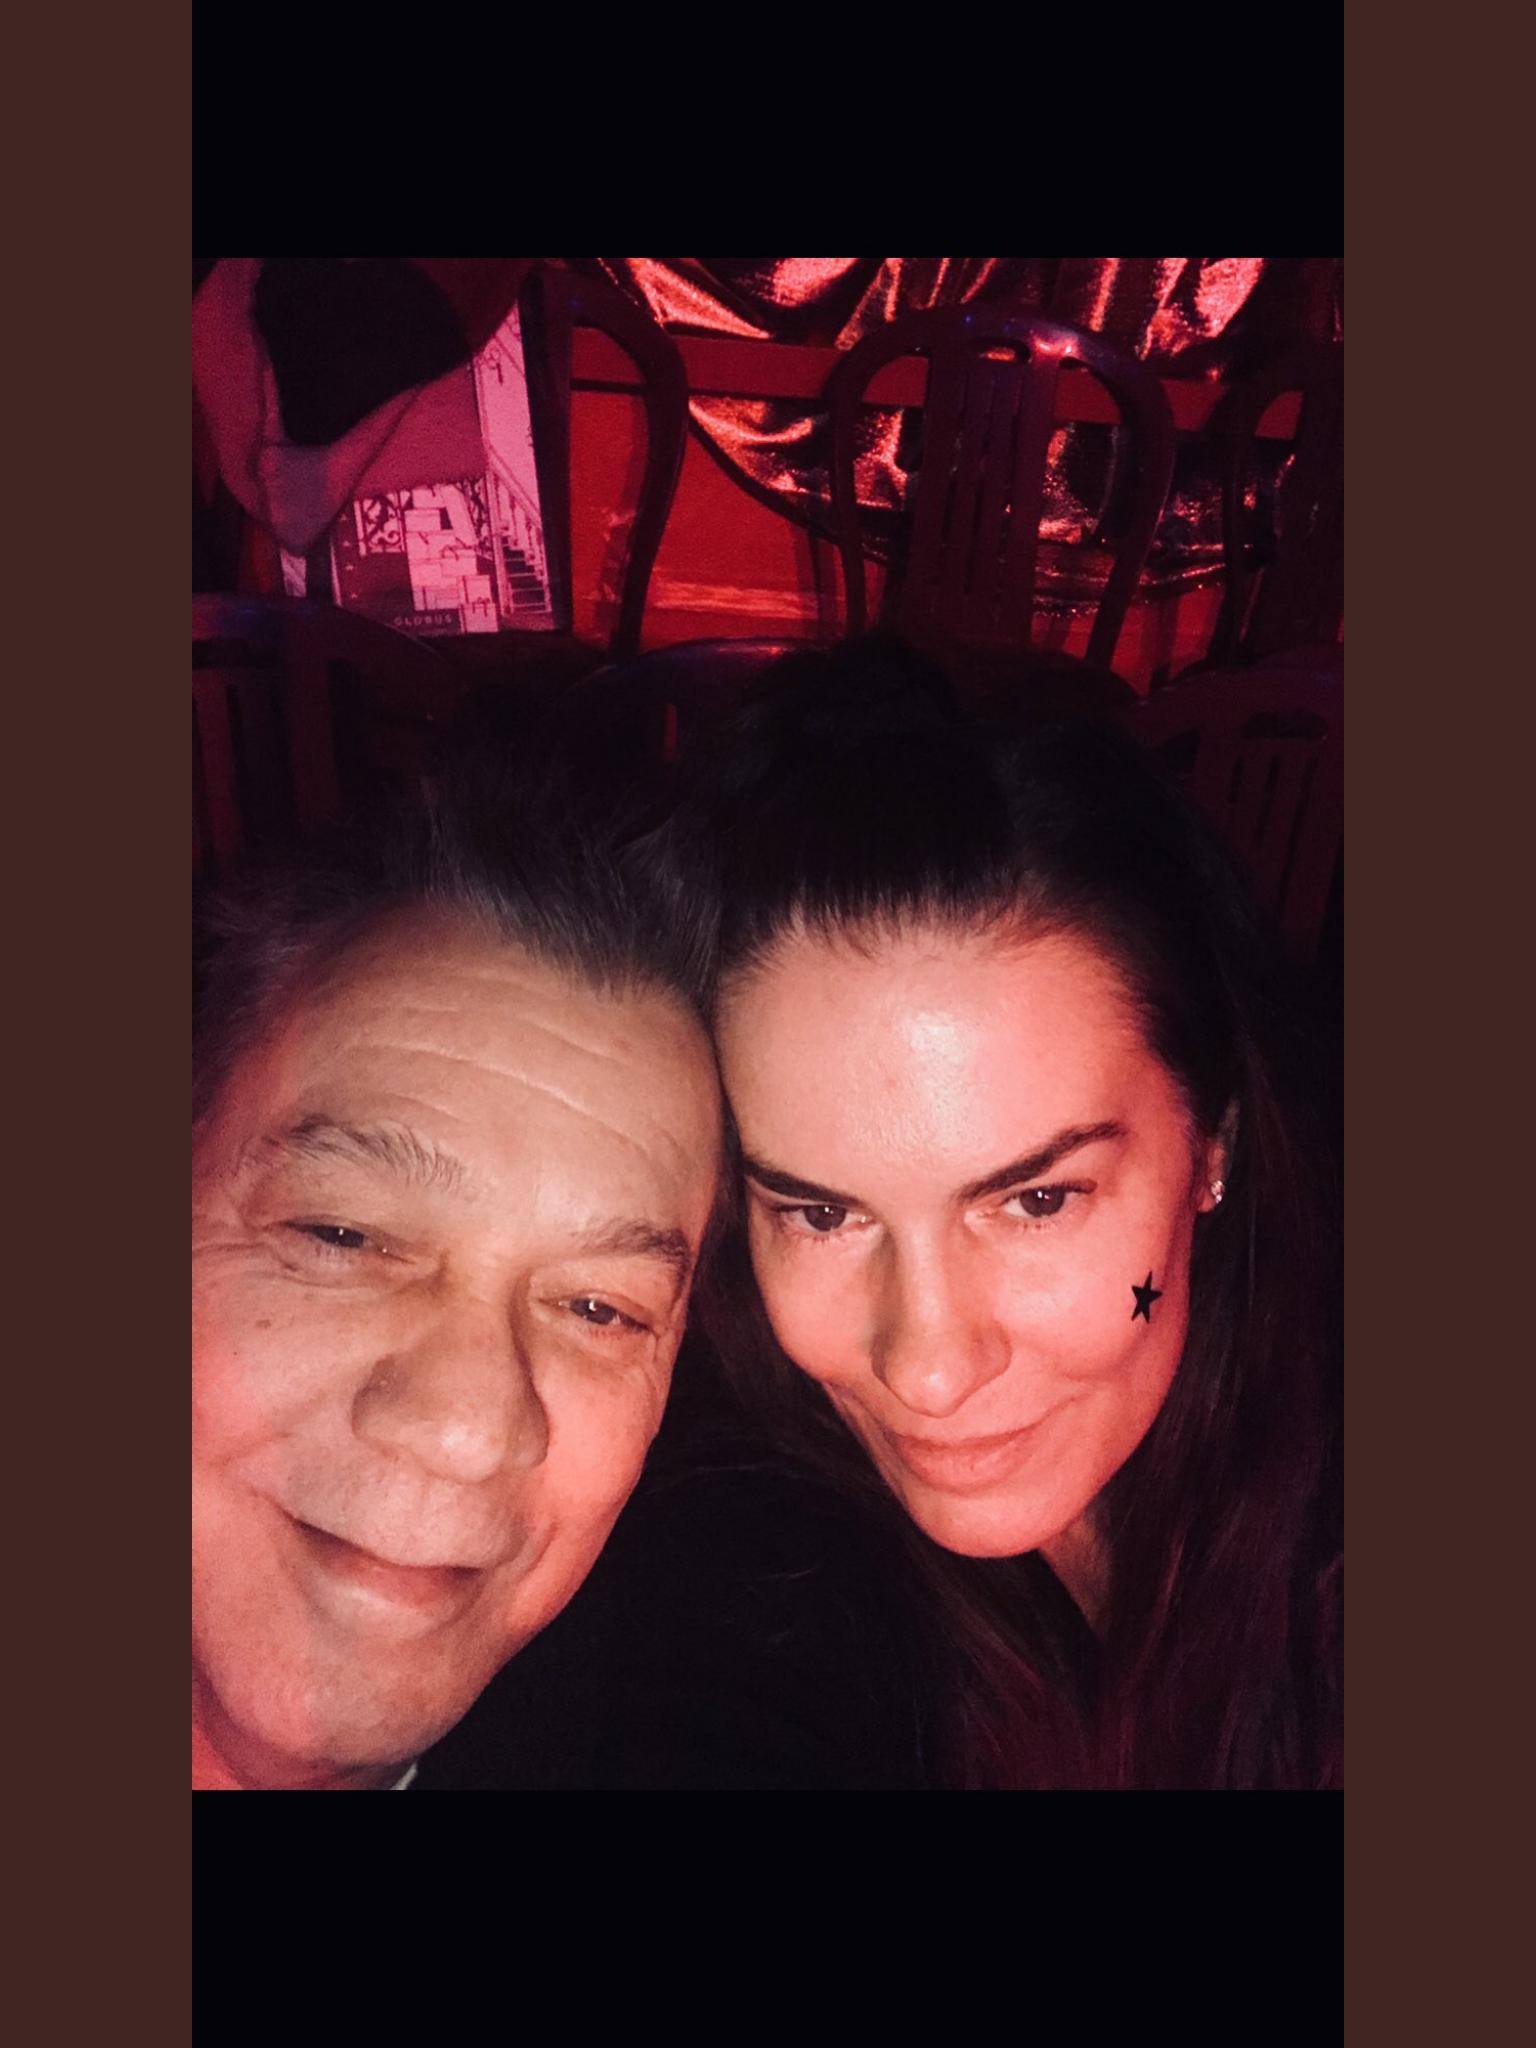 Eddie Van Halen Janie Van Halen Date Night At Circus Conelli On The Limmat River Van Halen Eddie Van Halen Van Halen 5150